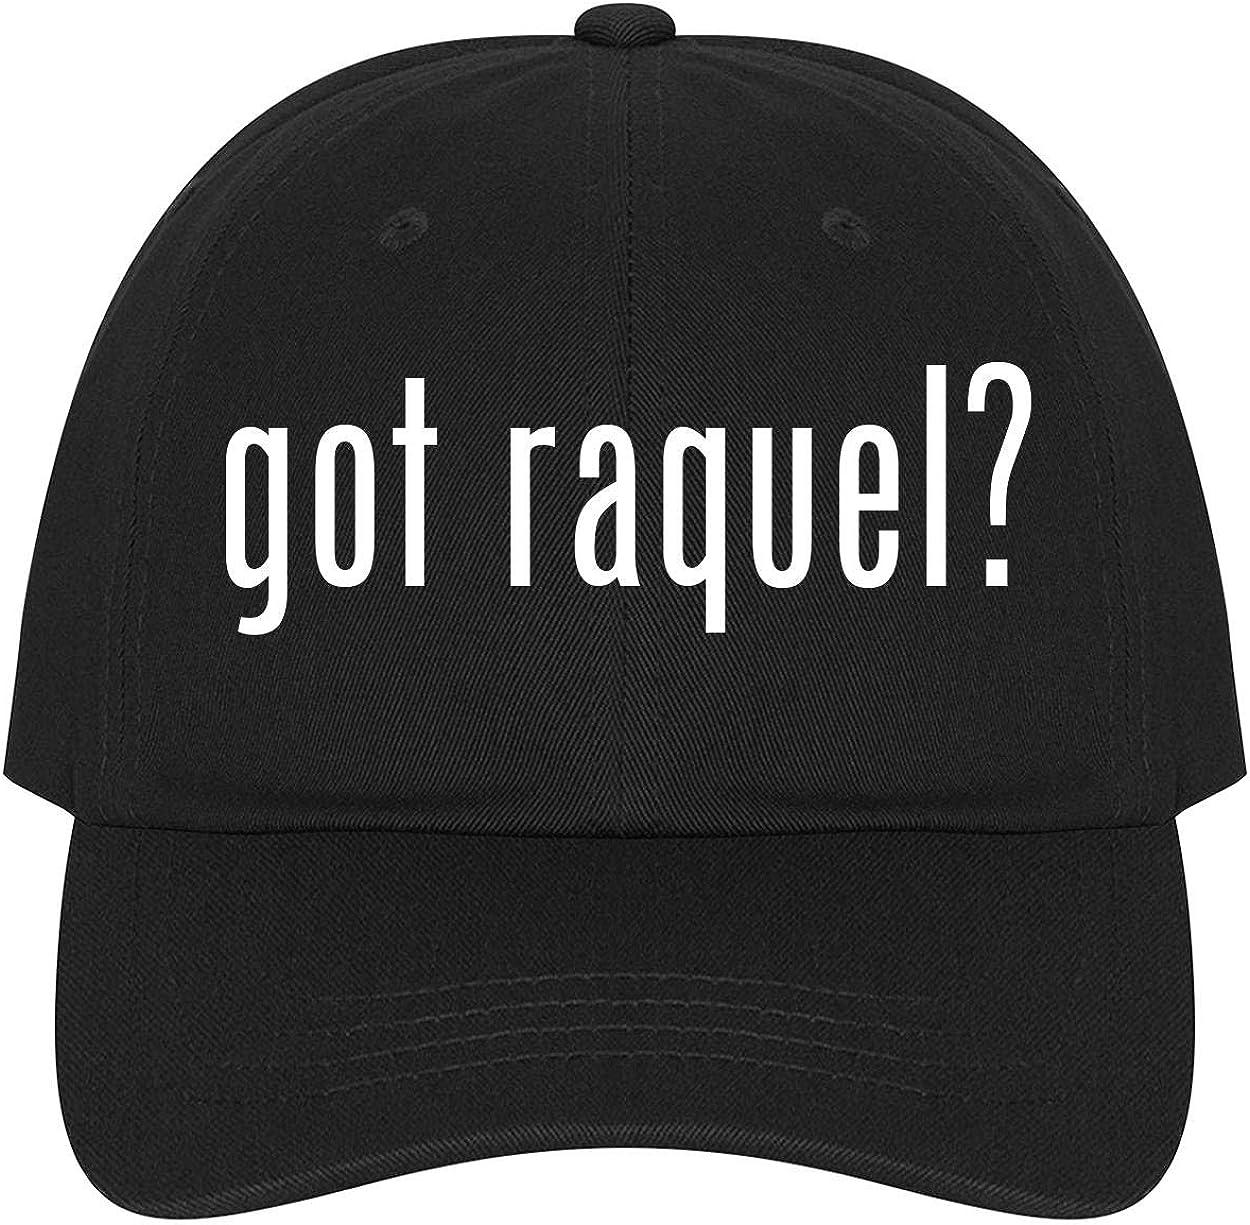 A Nice Comfortable Adjustable Dad Hat Cap The Town Butler got Raquel?